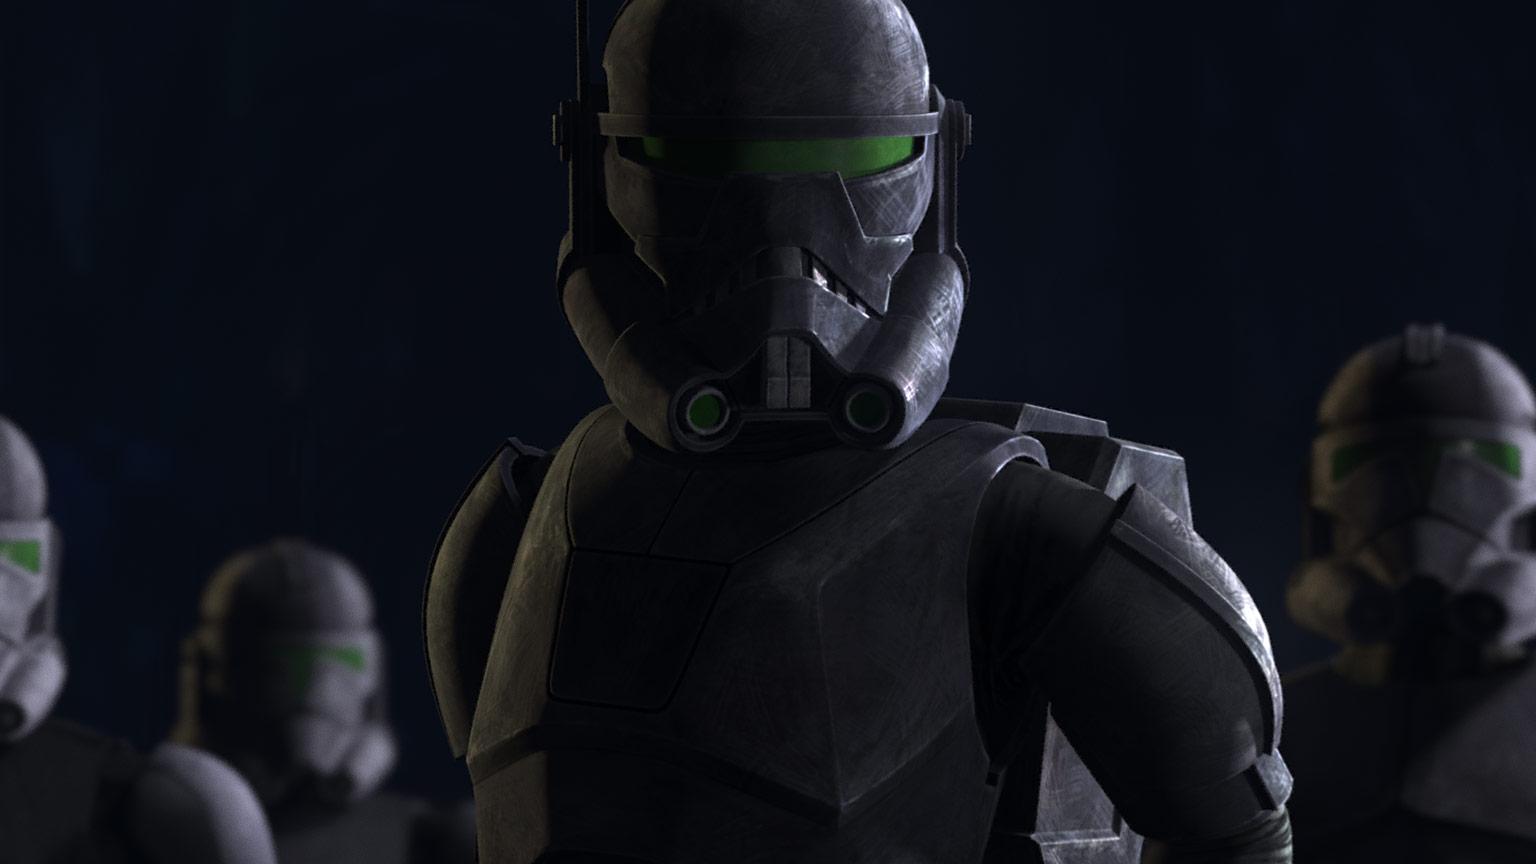 The Bad Batch Crosshair leader della Elite Squad